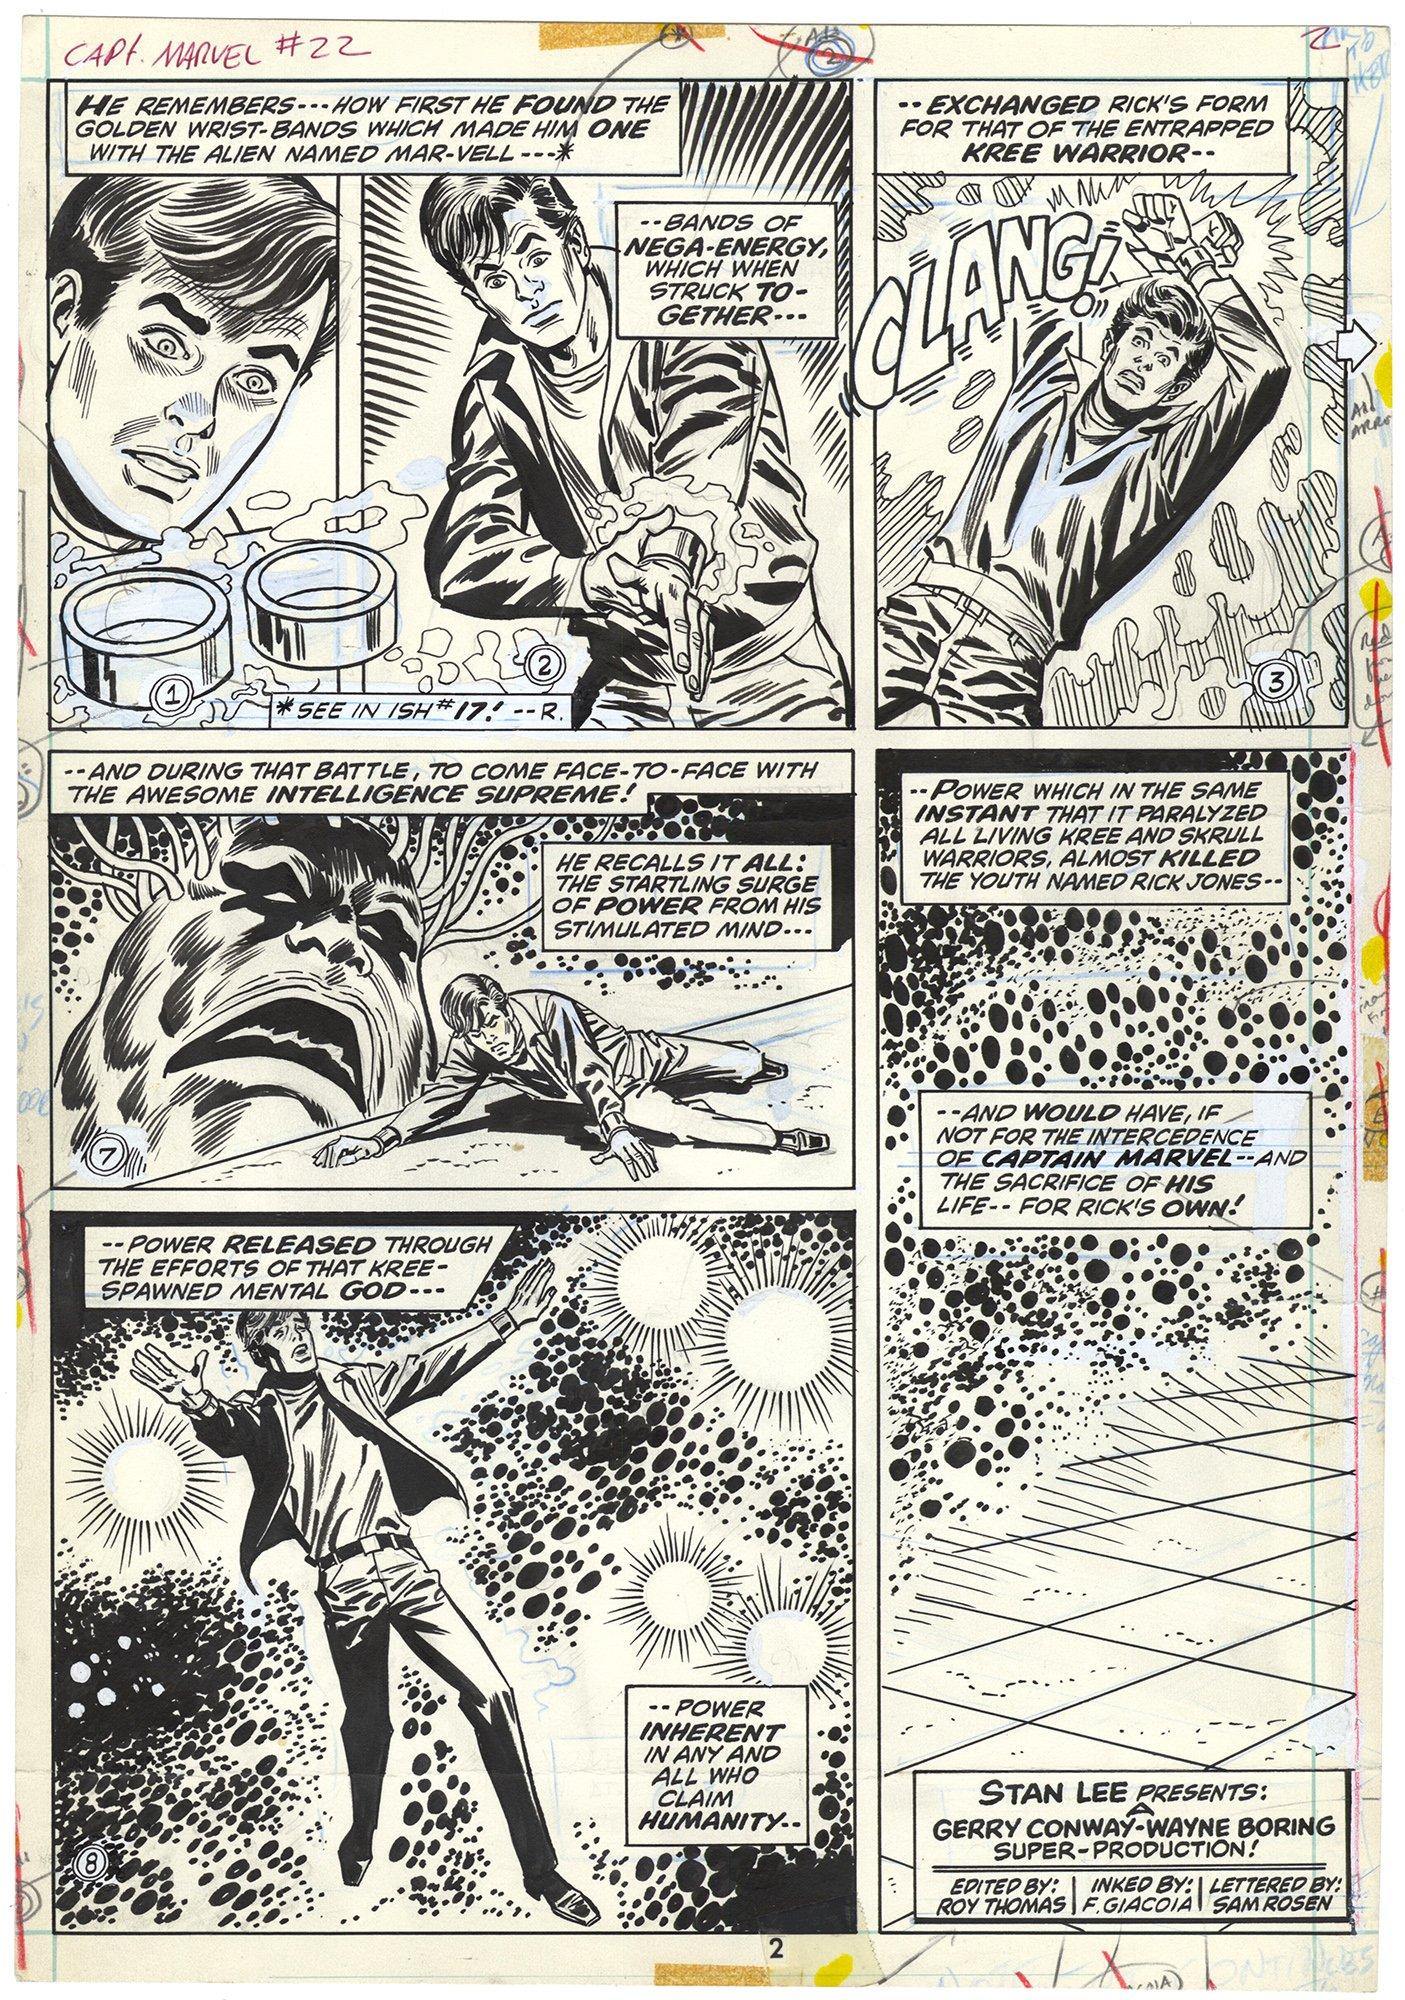 Captain Marvel #22 p2